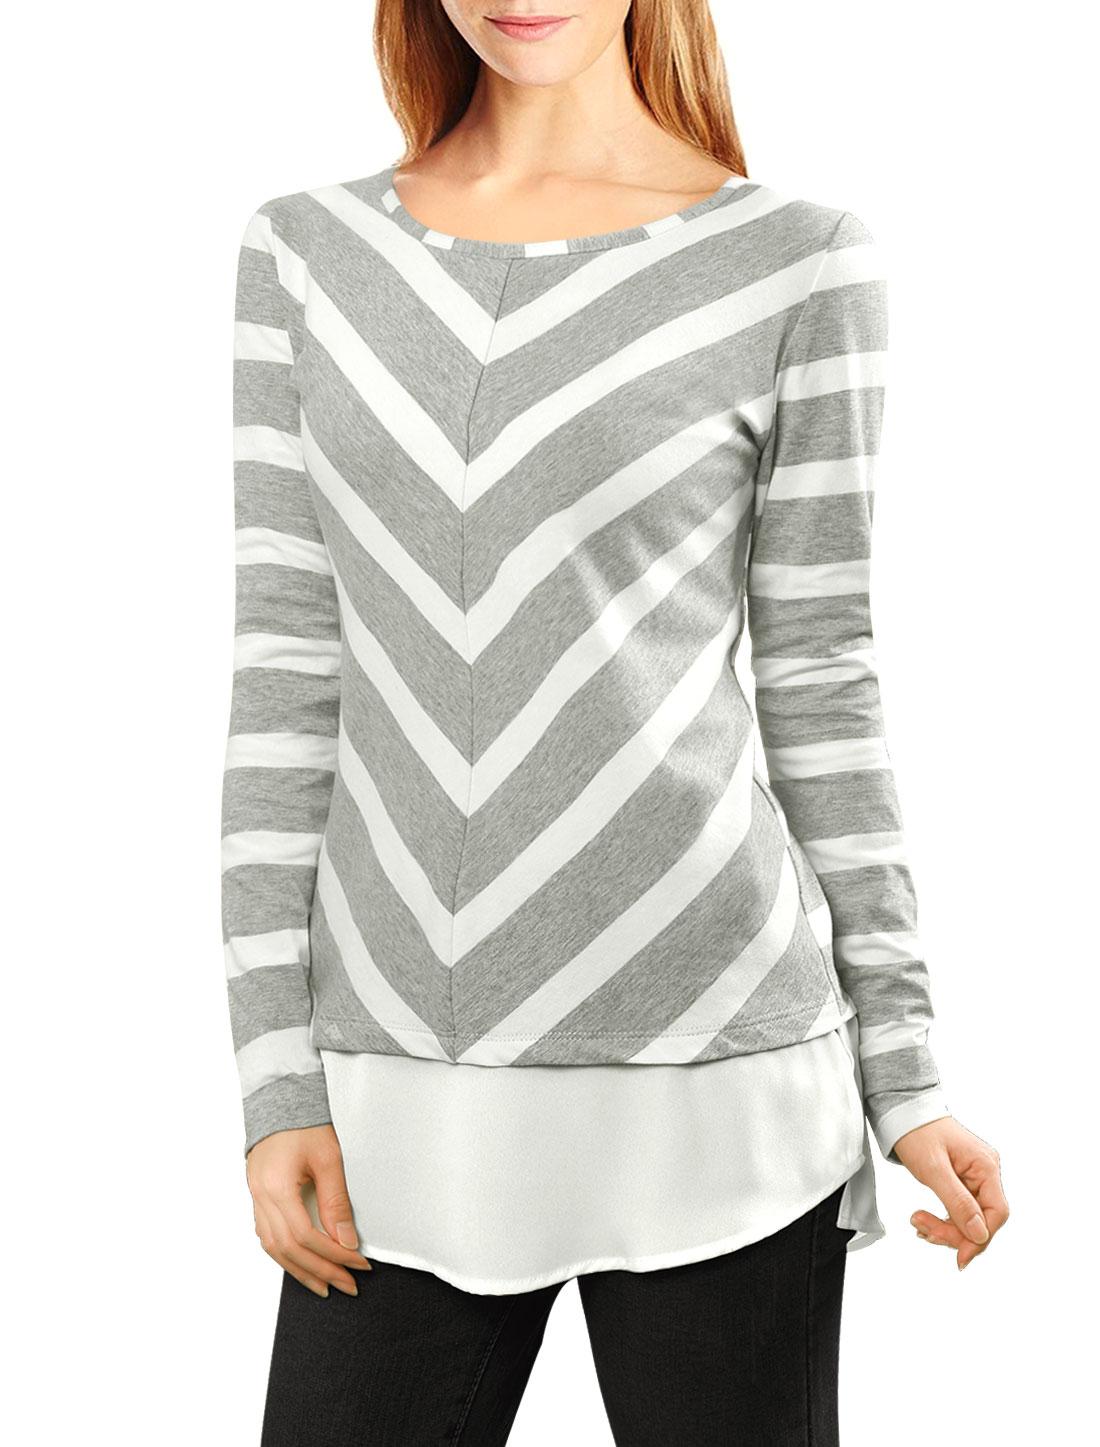 Women Layered Tunic Top in Striped and Chevron Print Gray XS